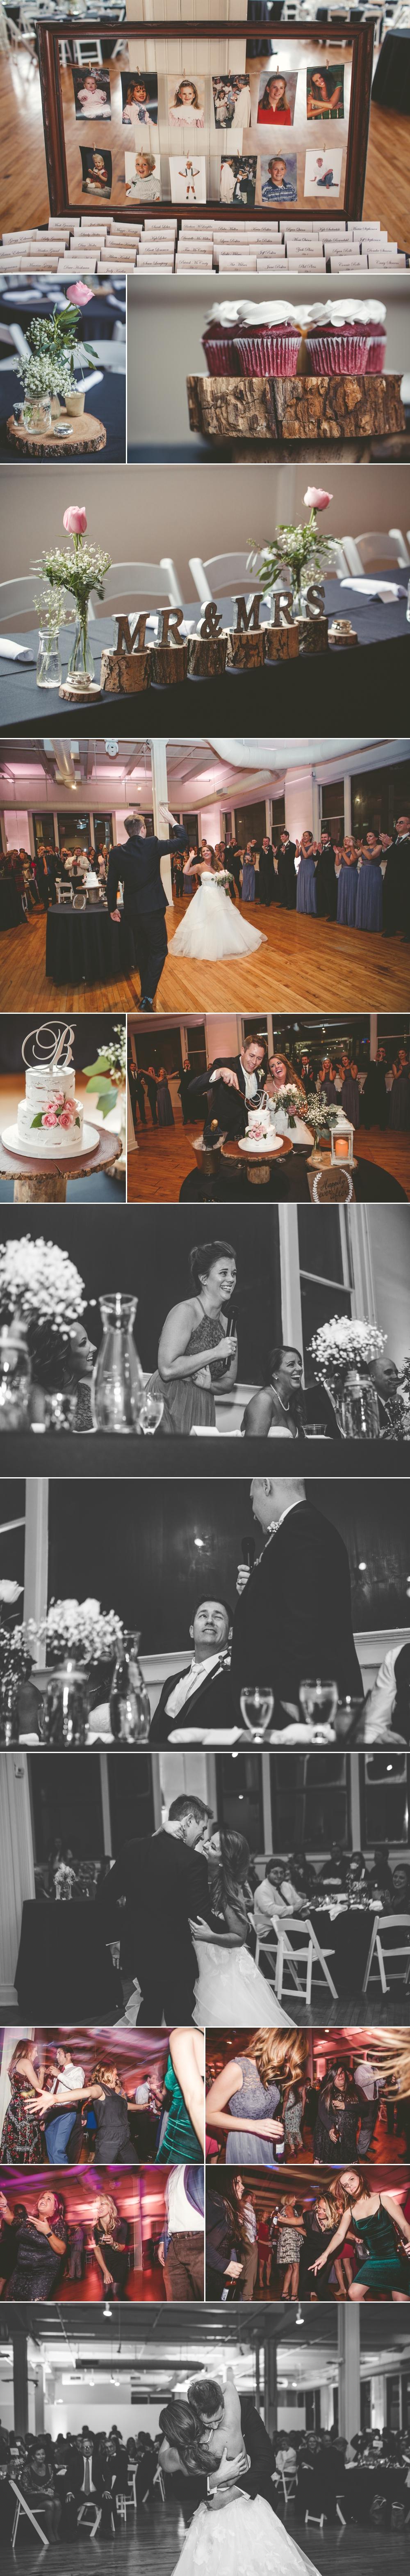 jason_domingues_photography_best_kansas_city_wedding_photographer_kc_weddings_garment_house_0004.JPG